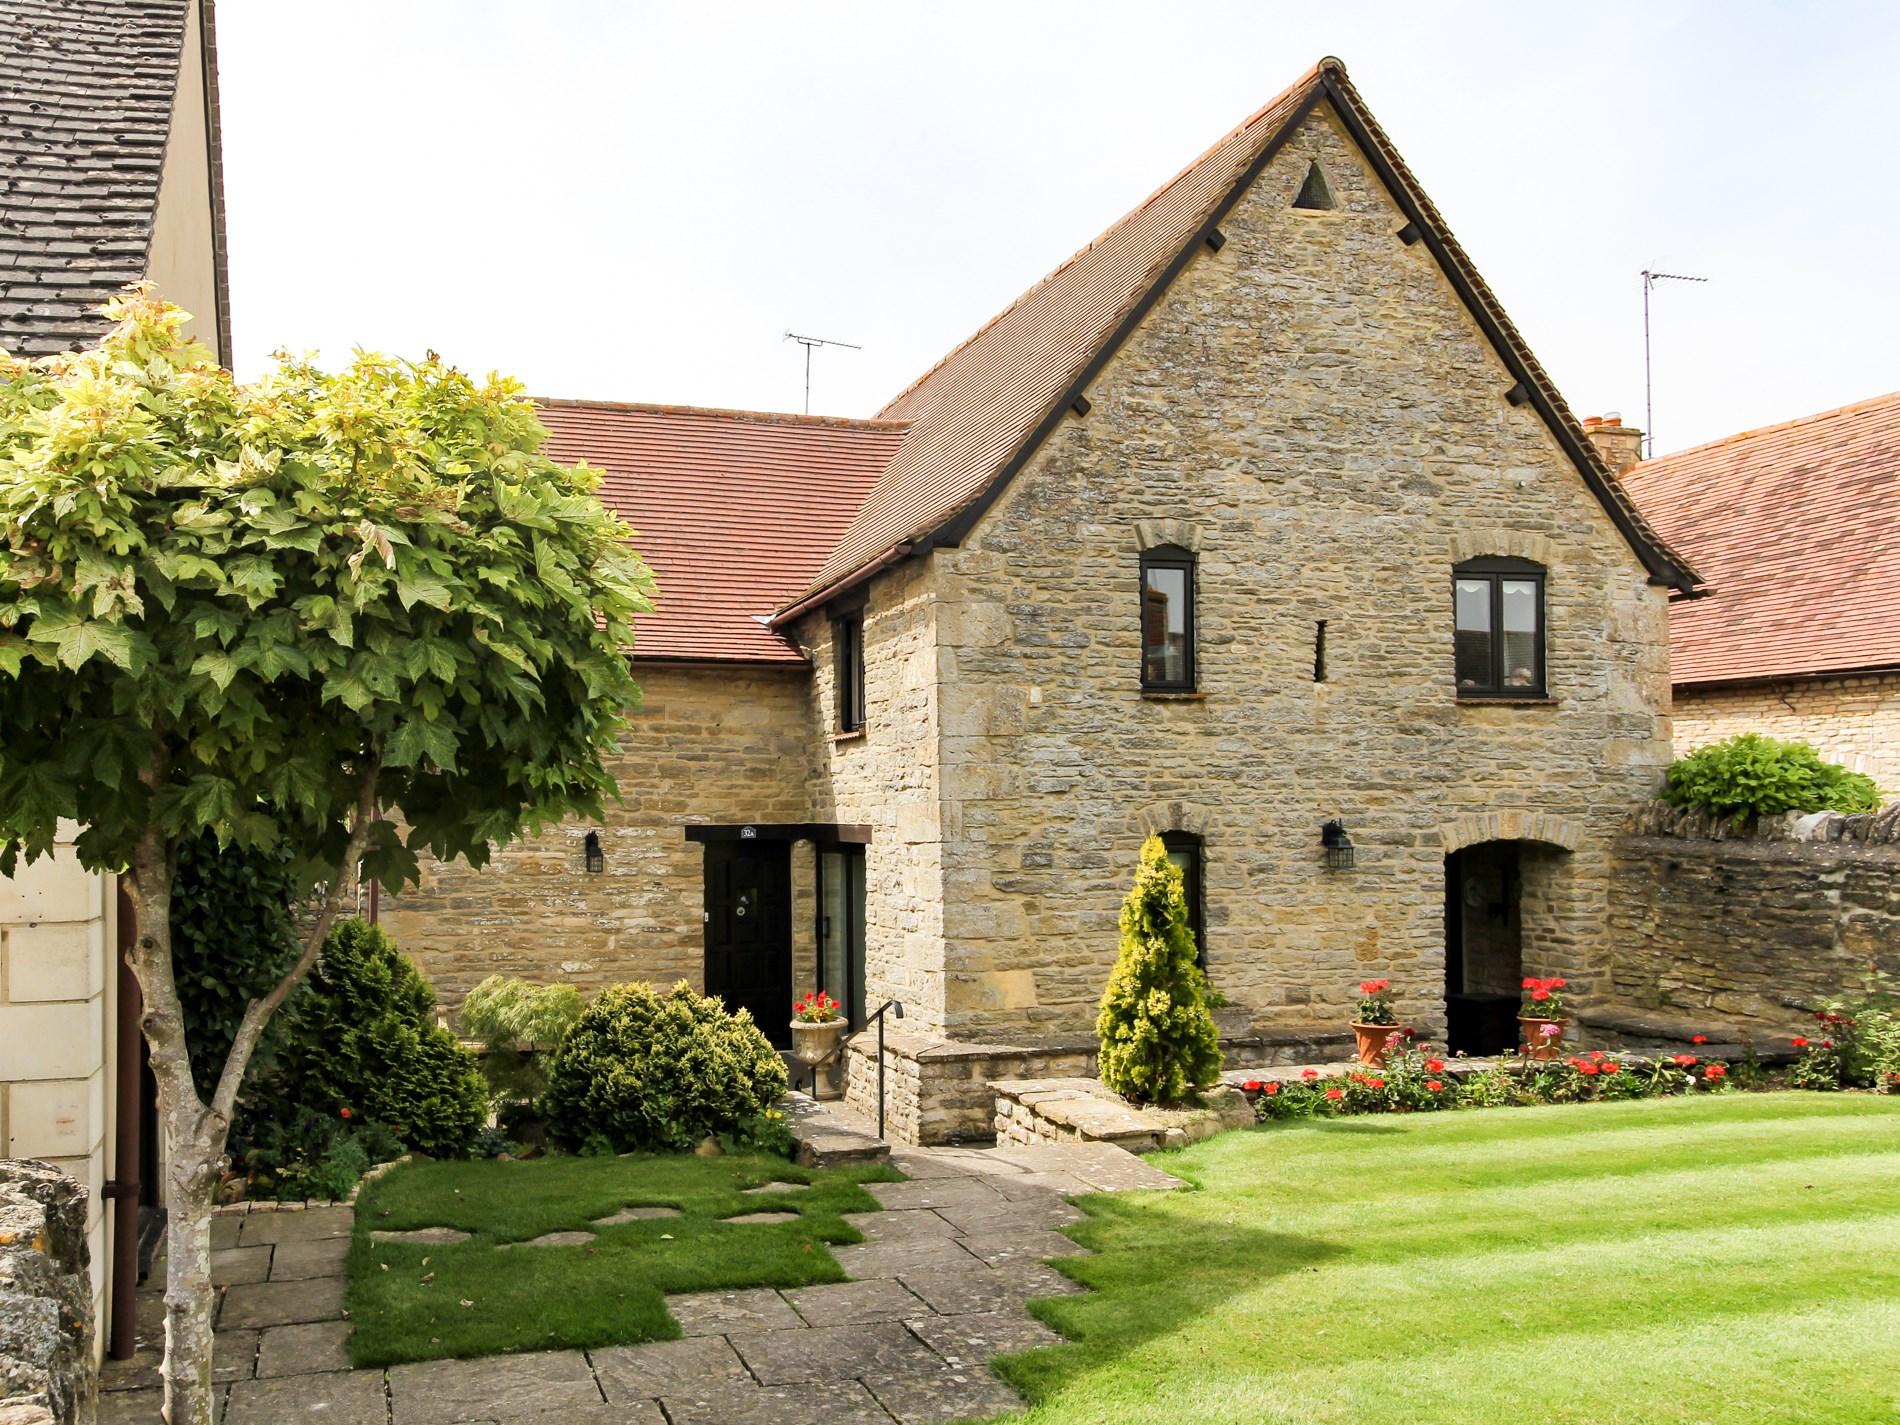 Ferienhaus in Burford